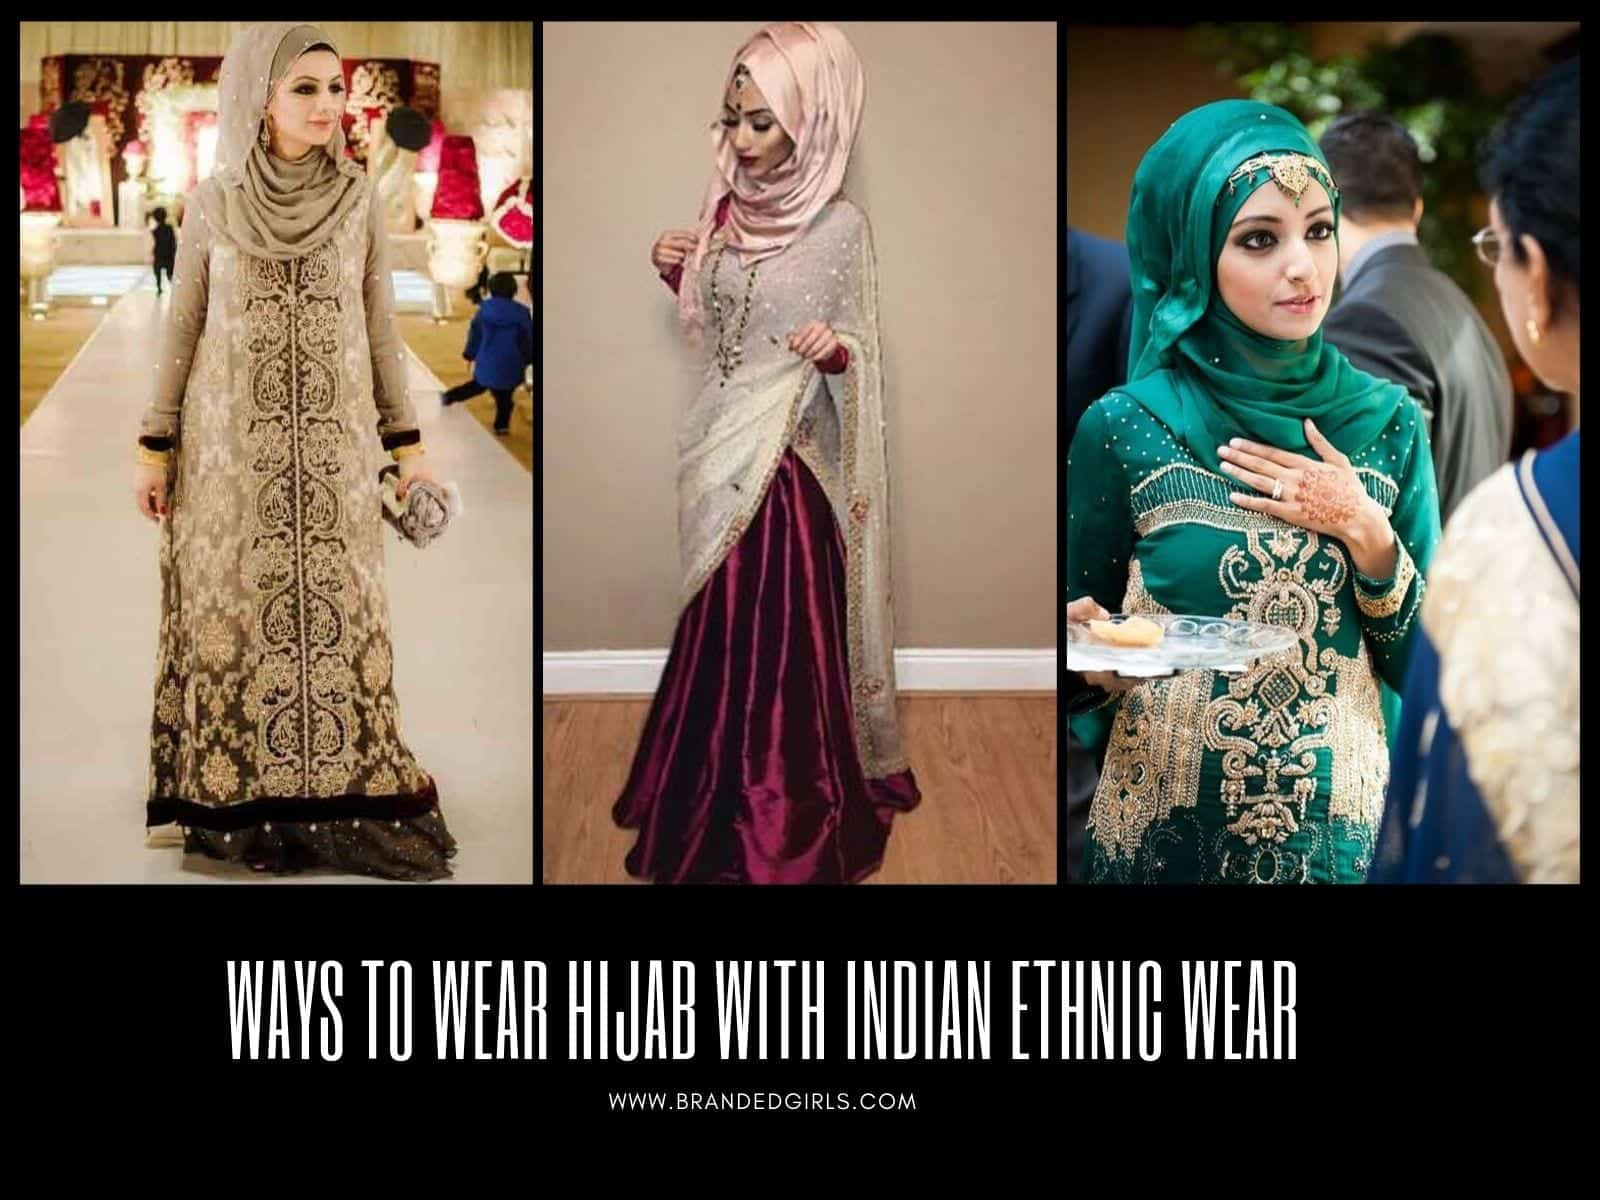 Ways-to-Wear-Hijab-with-Indian-Ethnic-Wear 30 Ways to Wear Hijab with Indian Ethnic Wear